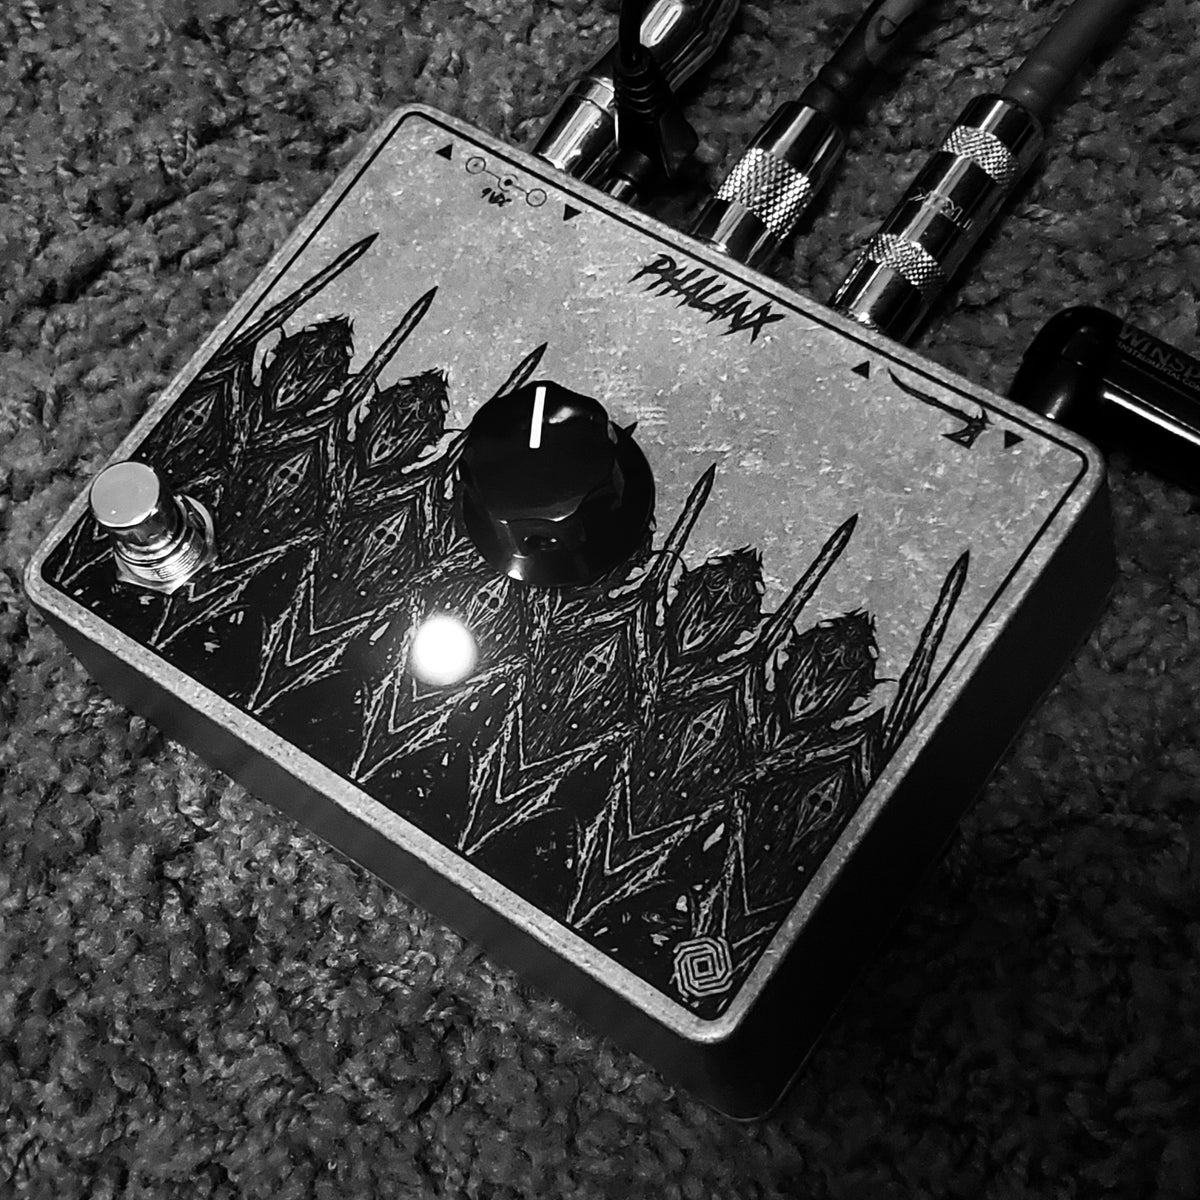 Image of Phalanx Noisegate *OCTOBER 2020 PRESALE*